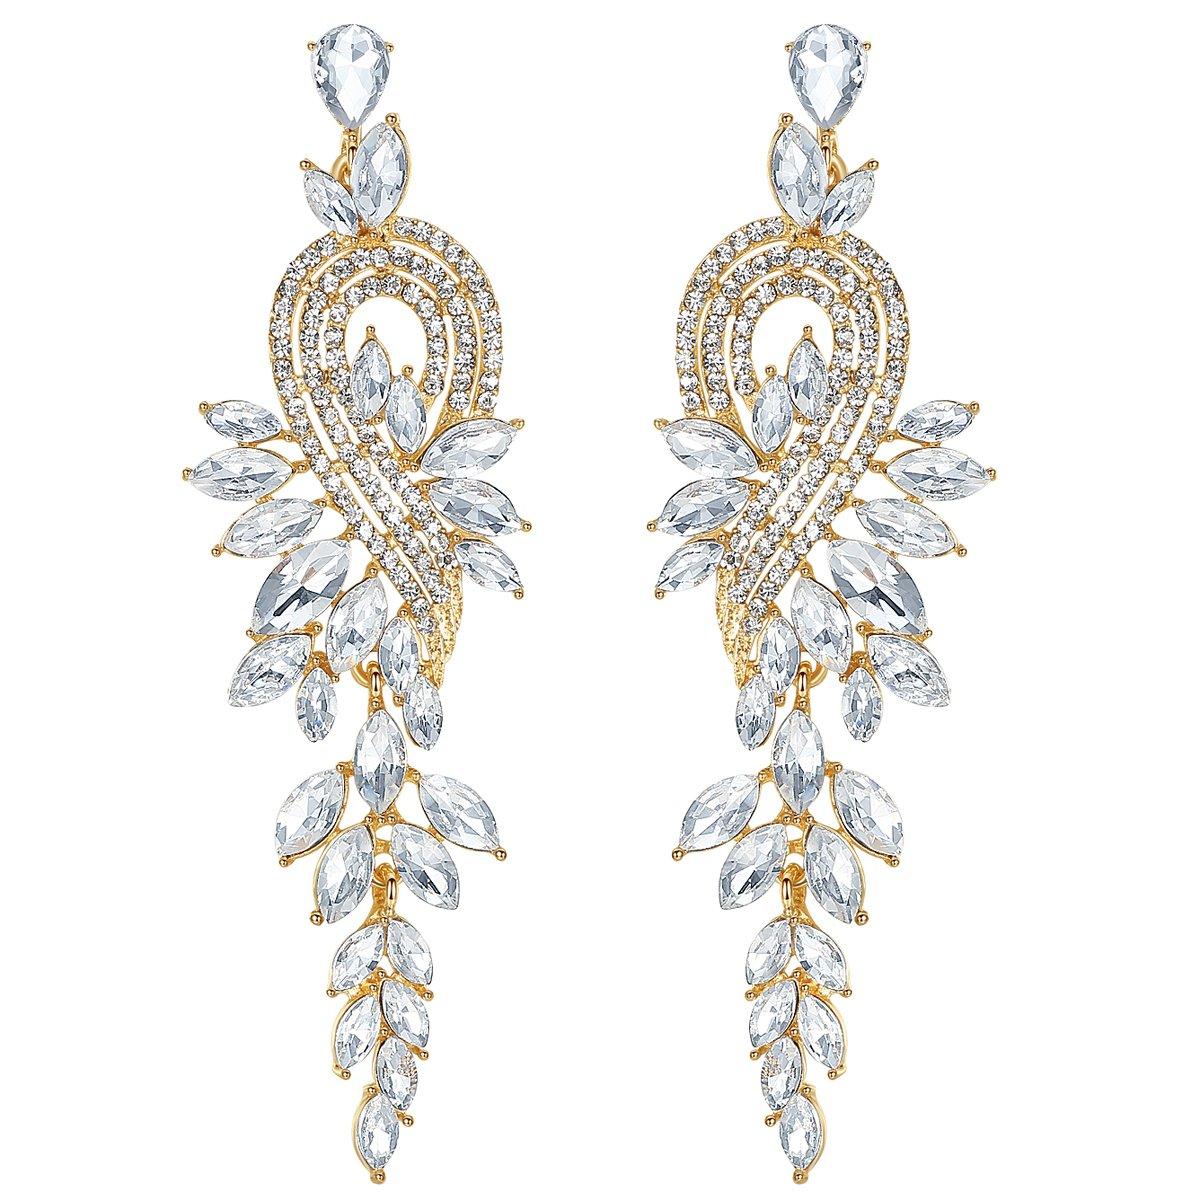 mecresh Gold Long Leaf Crystal Dangle Earrings for Women Bridesmaid Wedding Jewelry Gift